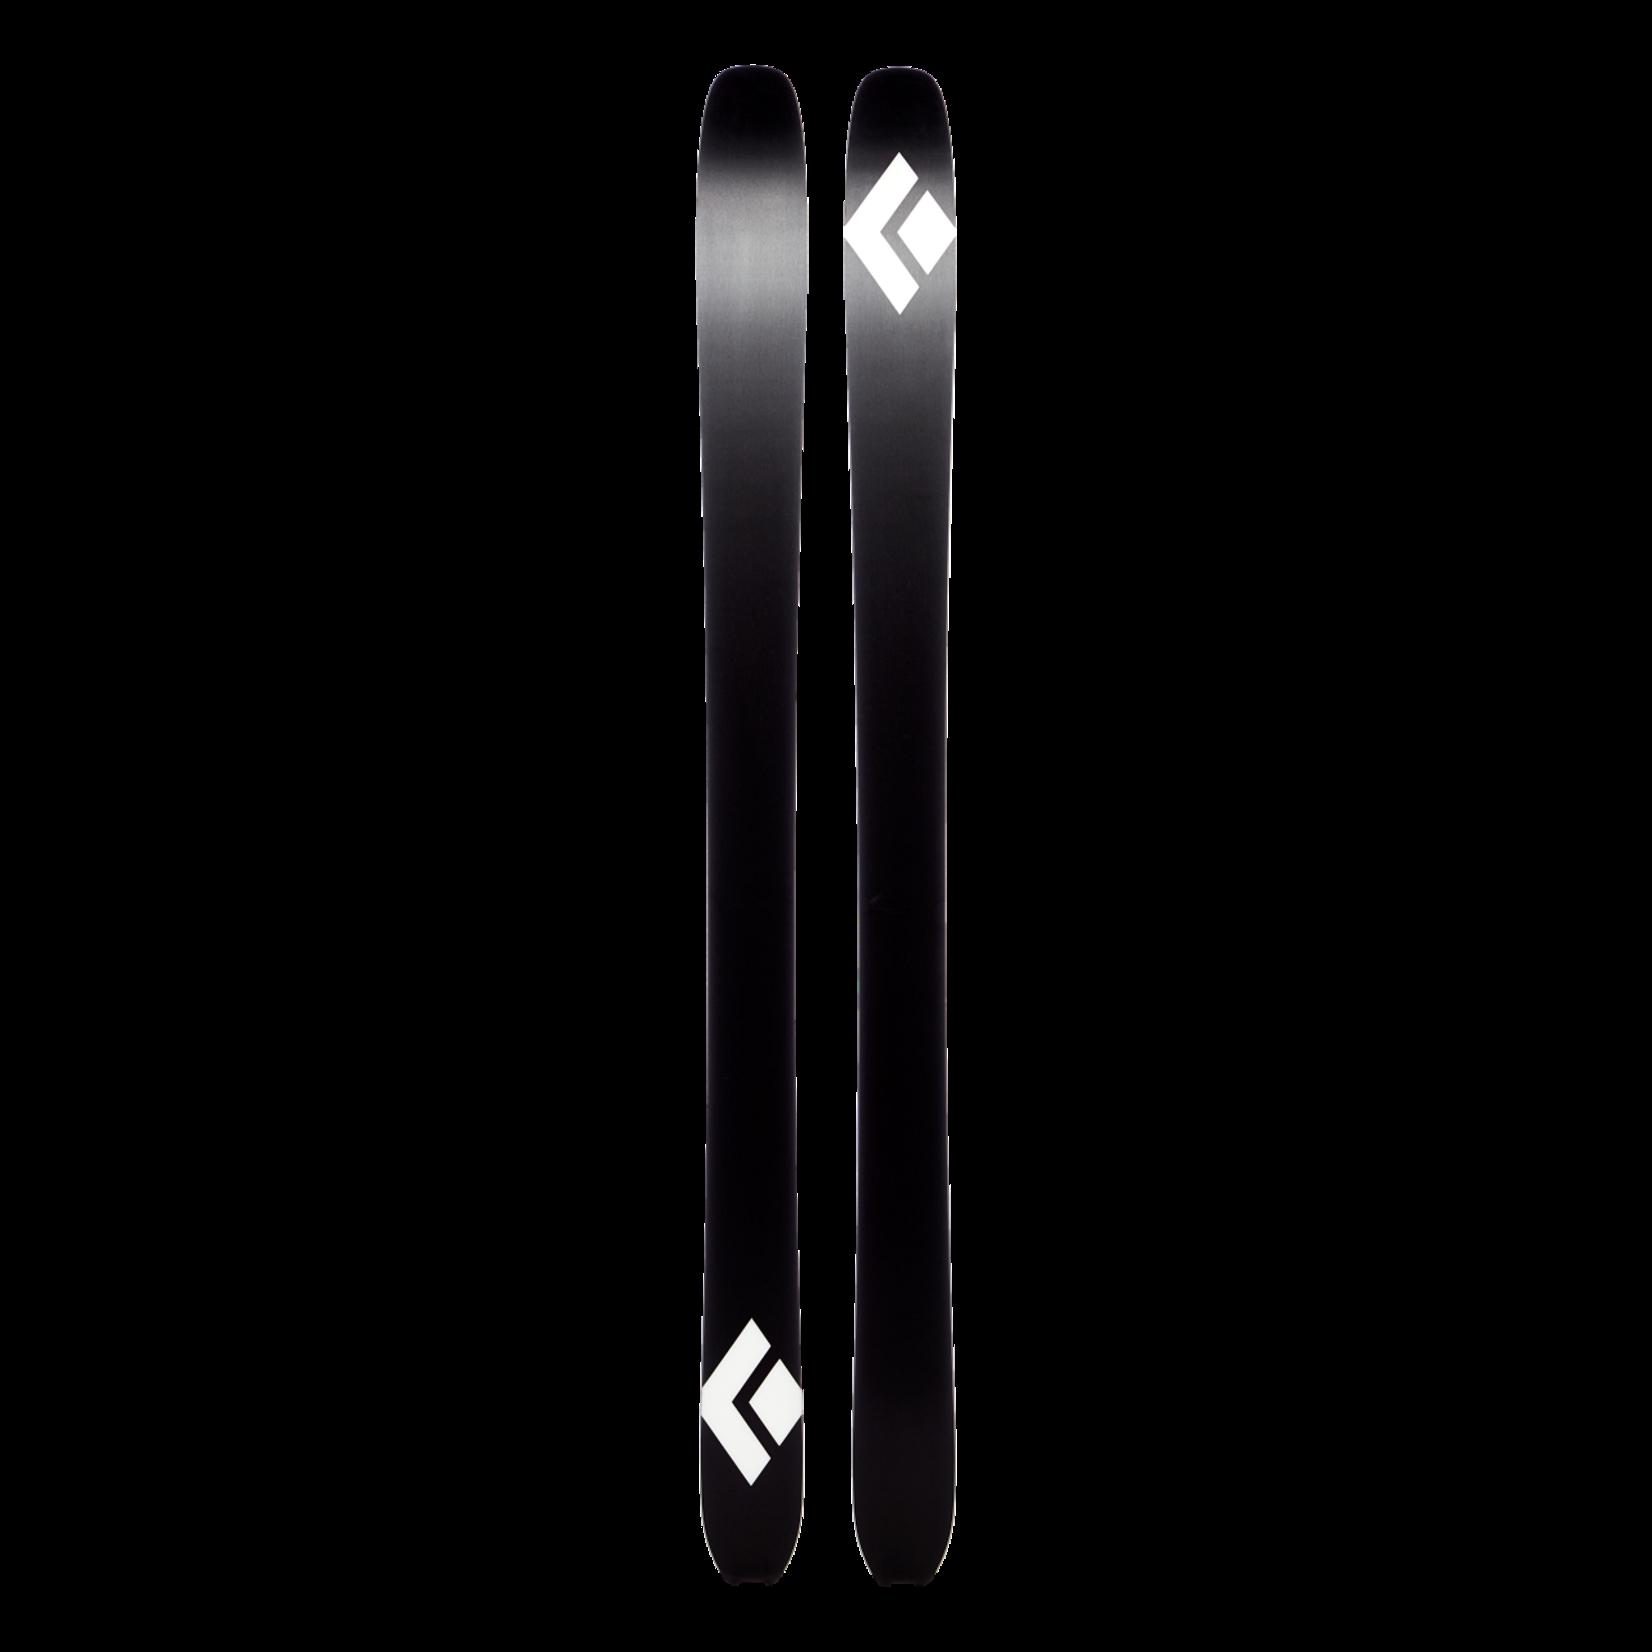 BD BD Impulse 112 Skis